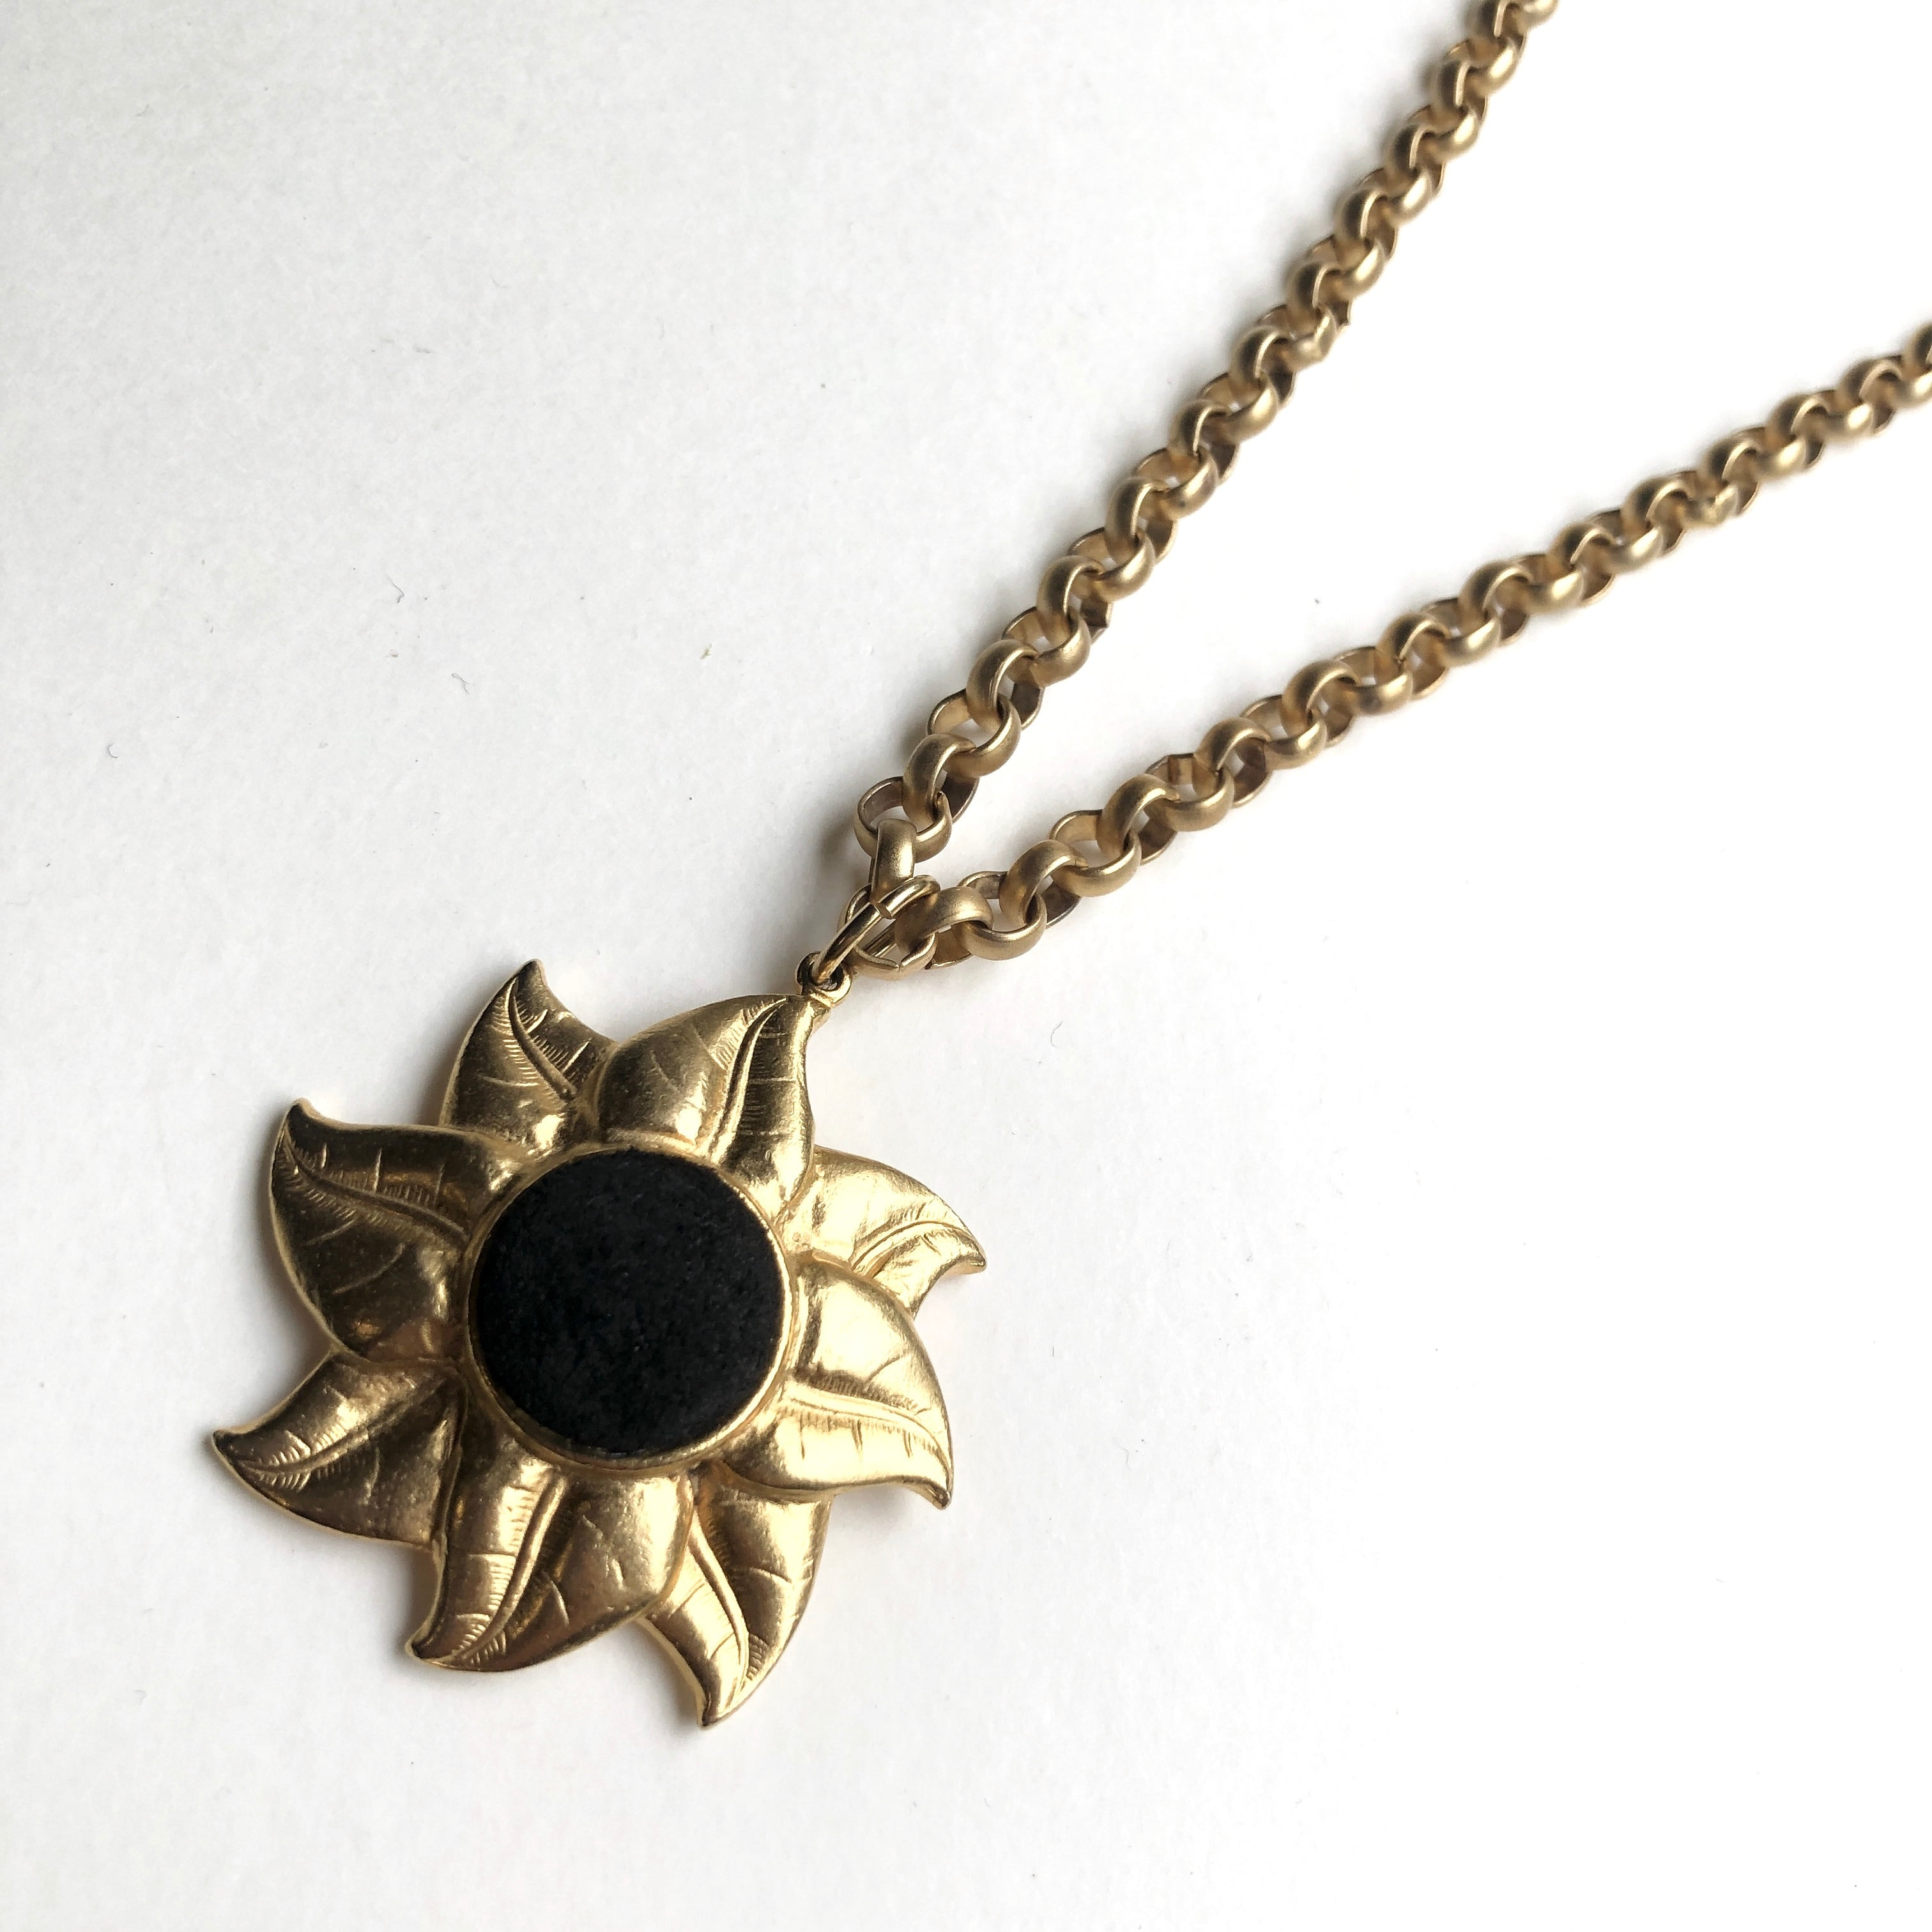 Sunny flower vintage Necklace NC-027x